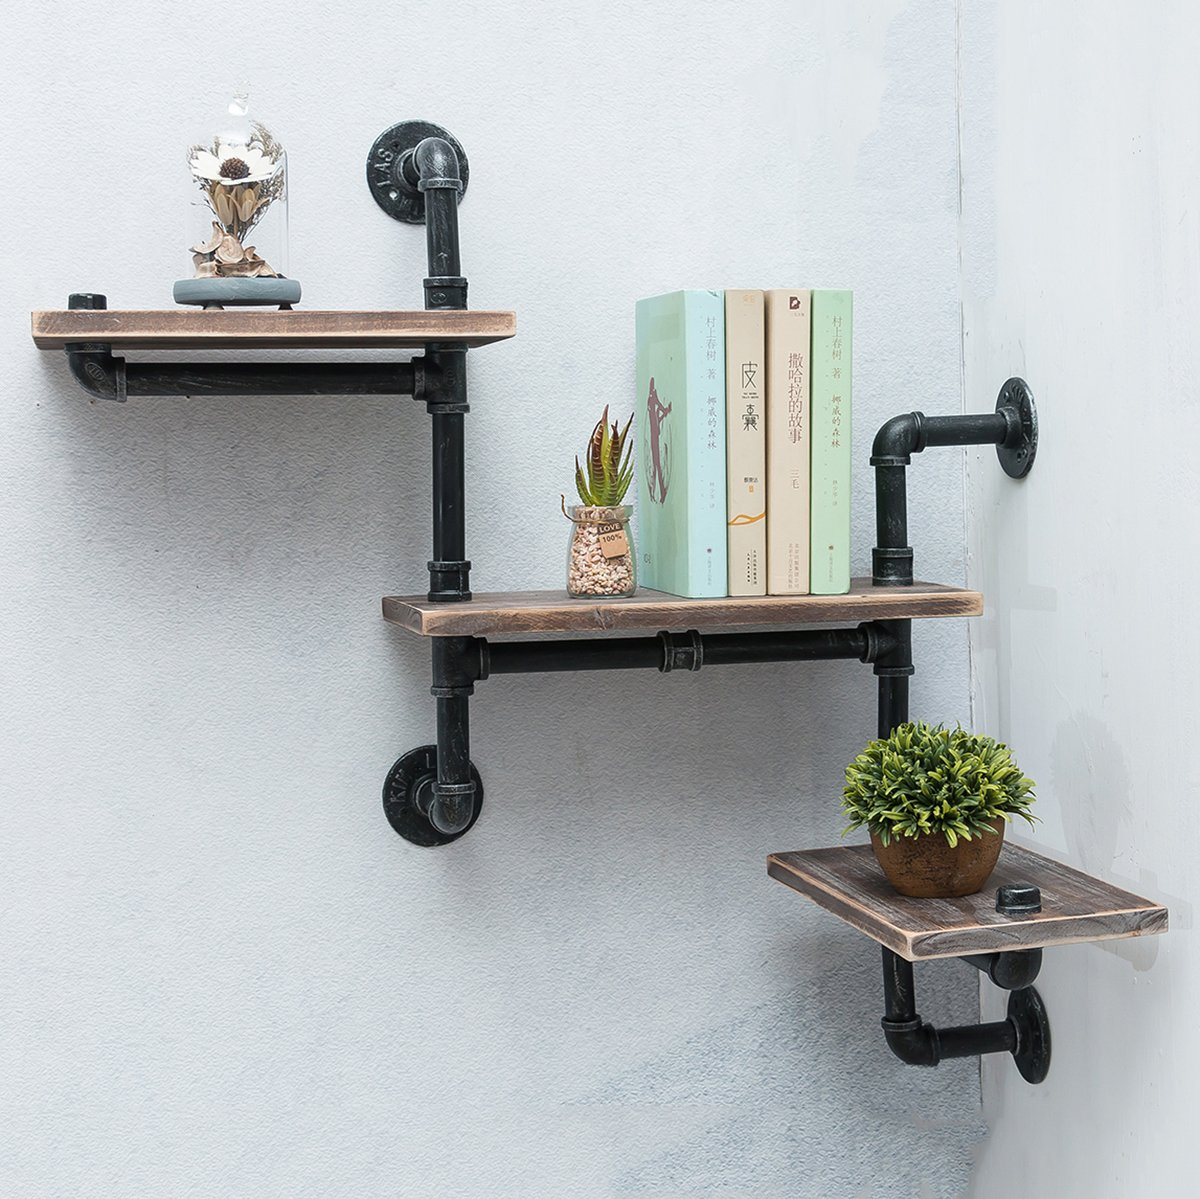 Mbqq Industrial Bookshelf Pipe Shelves 3 Tiers Rustic Wood